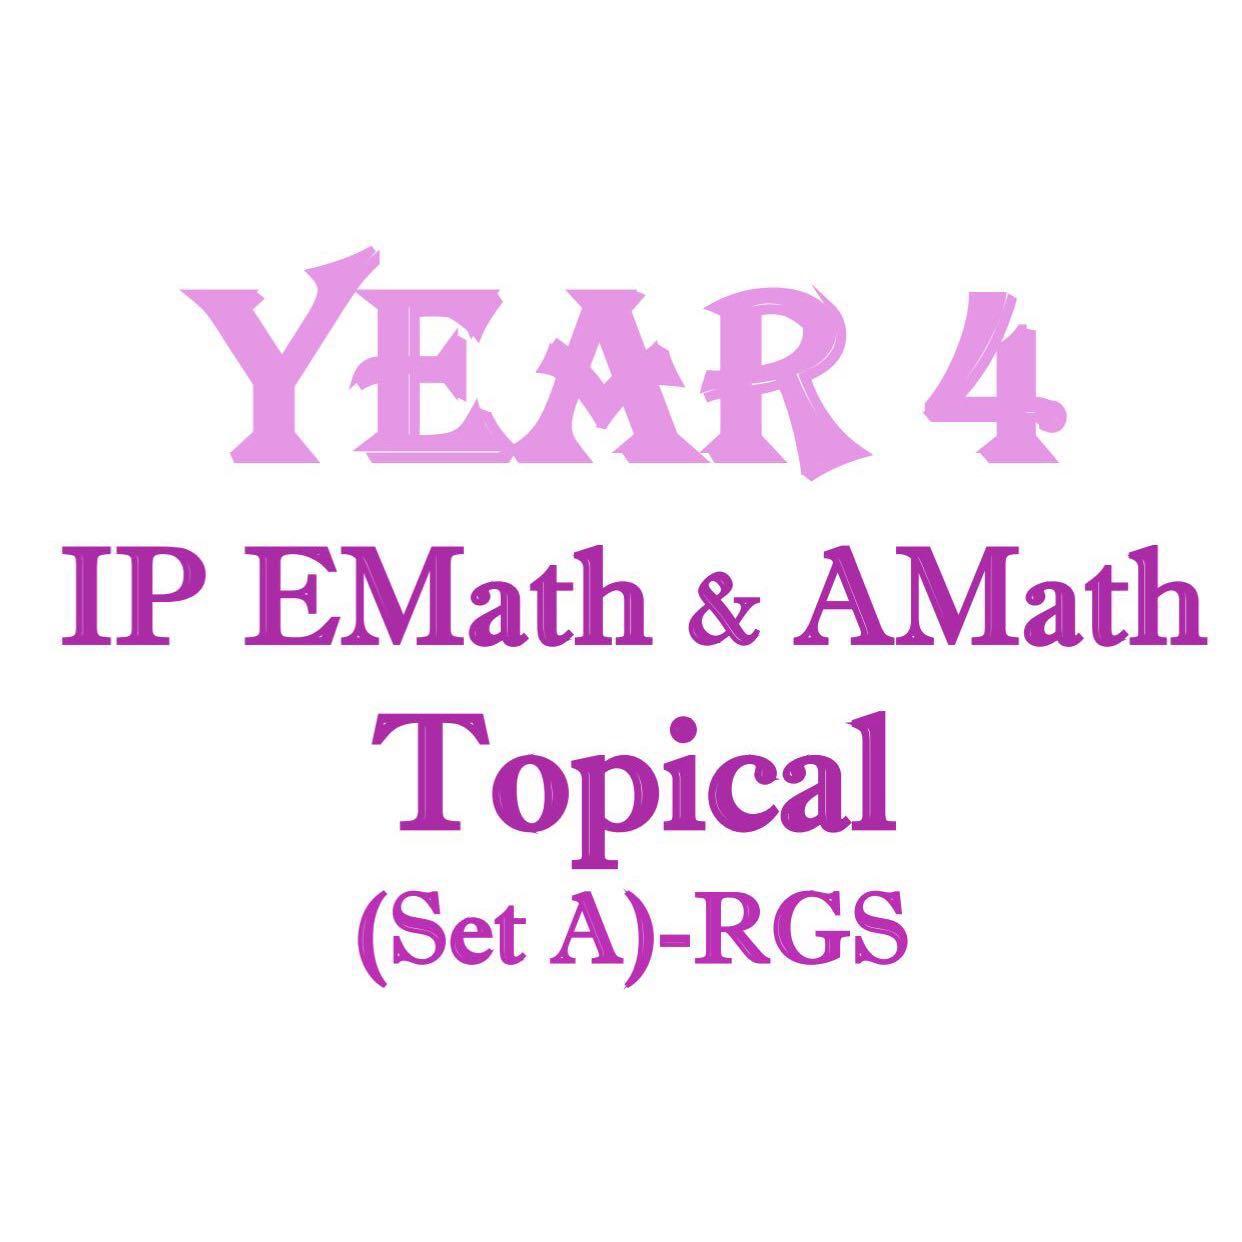 2017 IP Year 4 Math Topical Revision (Set A) / AMath / EMath ...